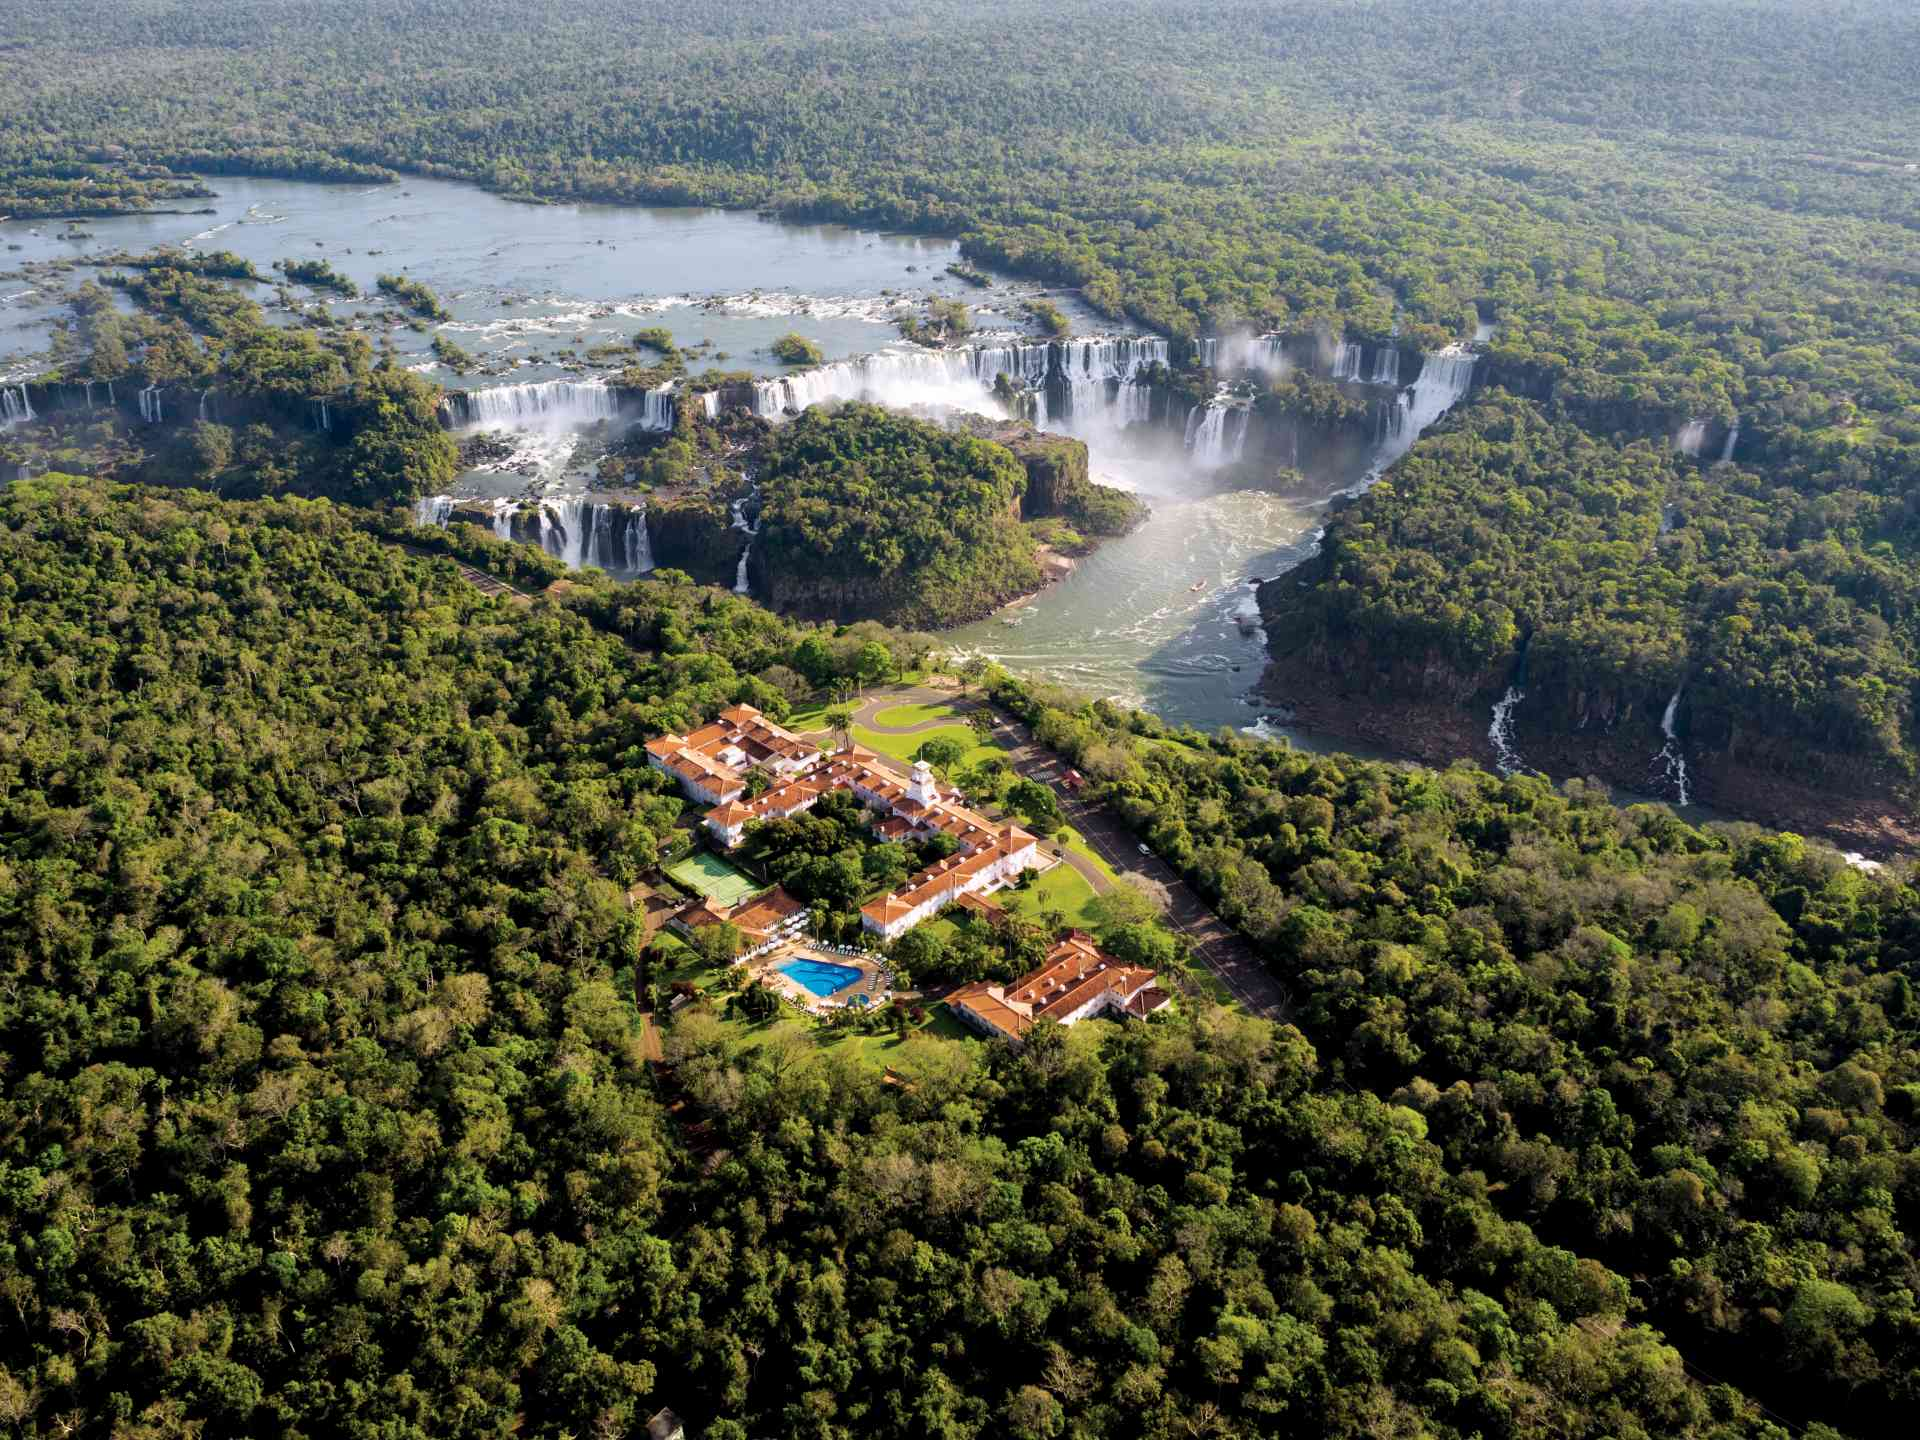 Belmond das Cataratas Hotel, Iguazu Falls, Brazil by David Hein